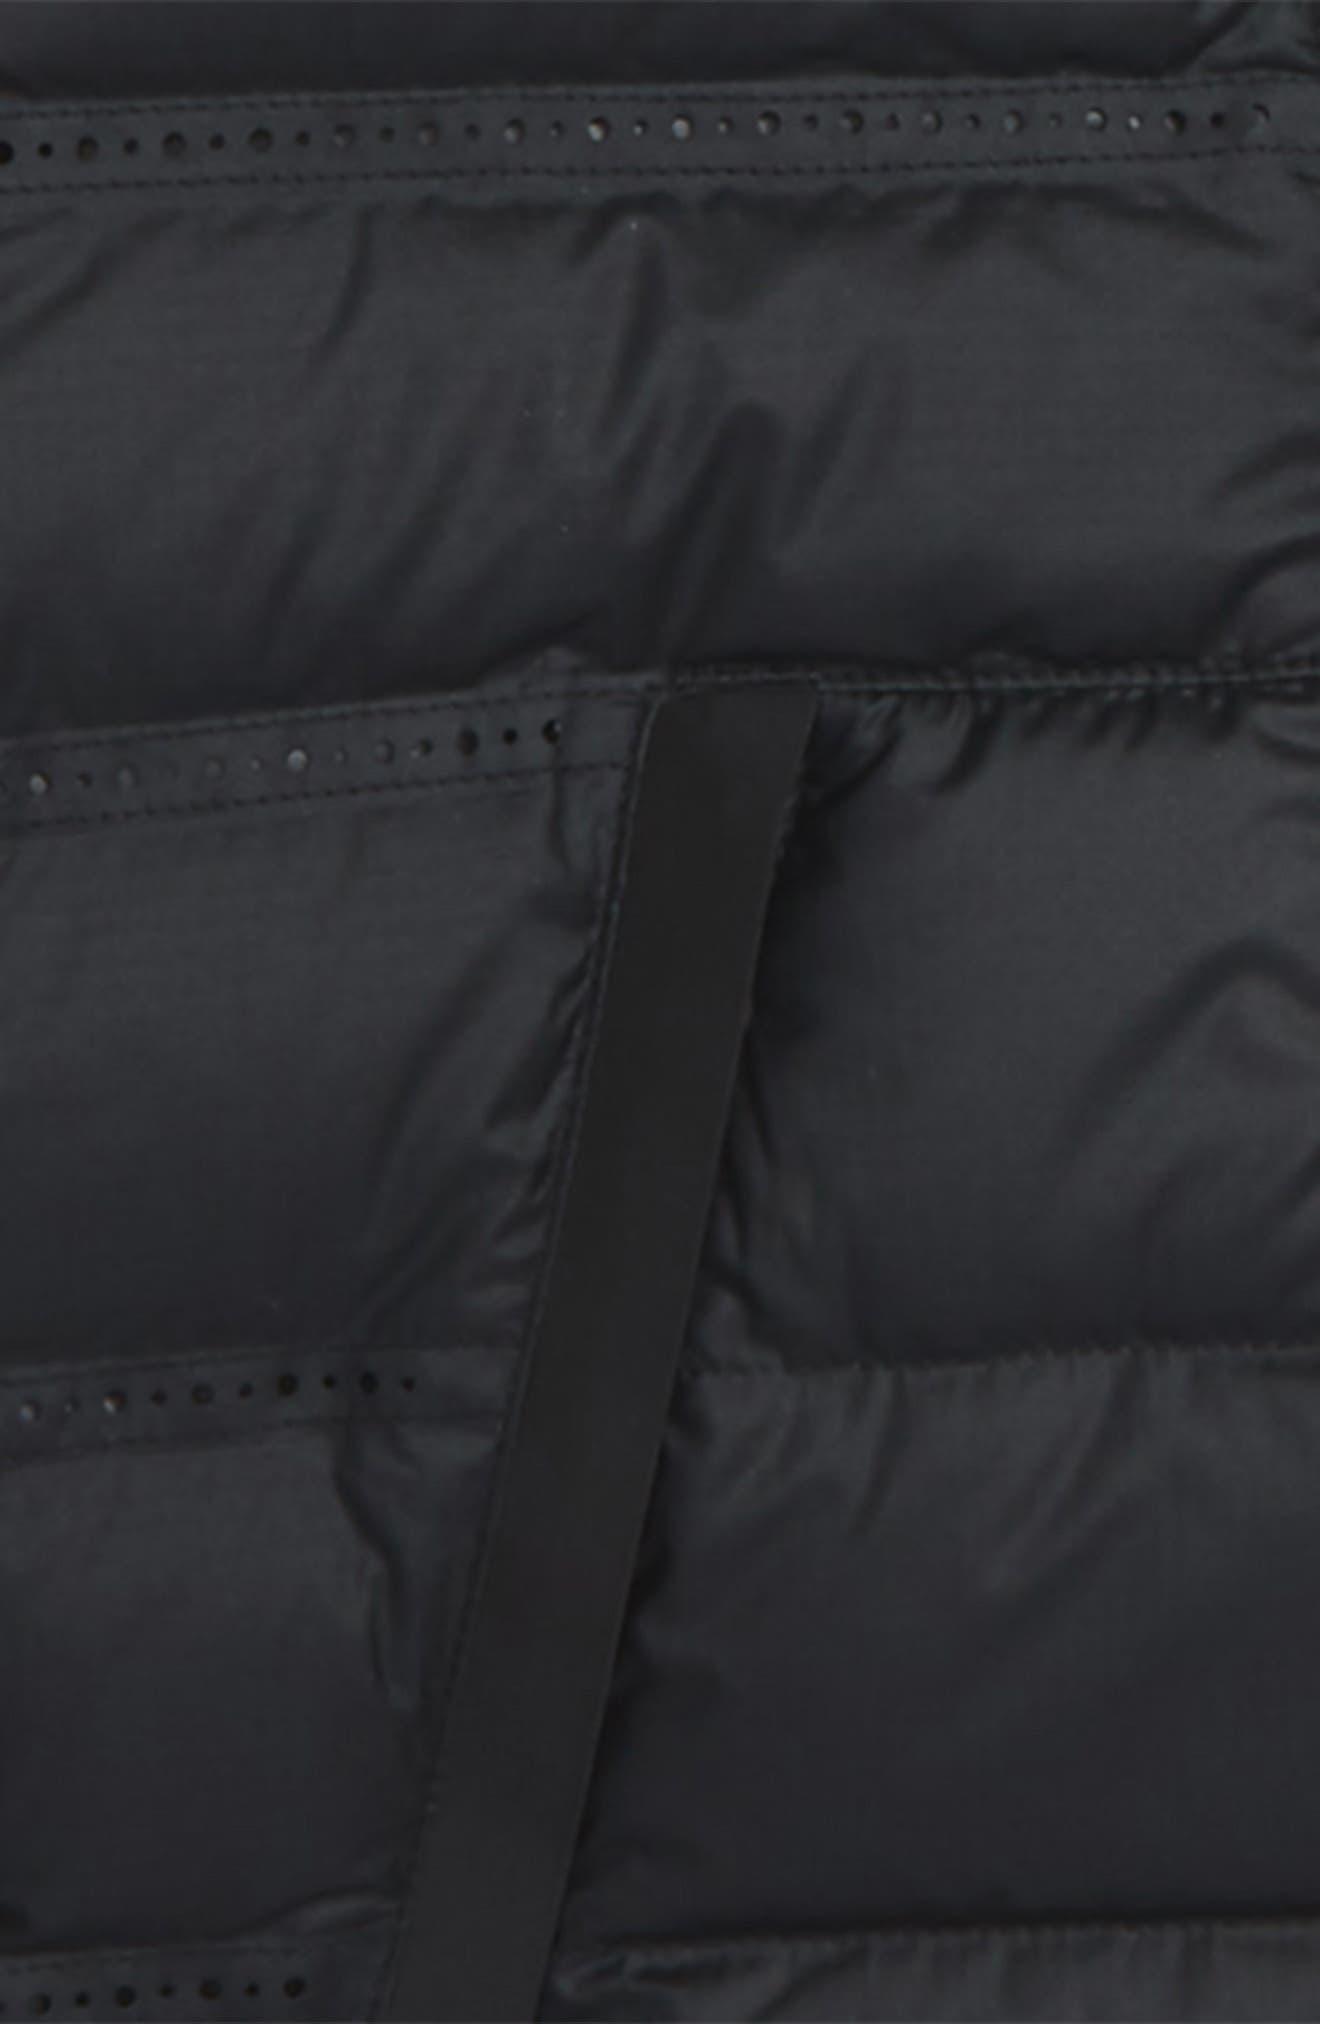 Sportswear Tech Fleece AeroLoft Jacket,                             Alternate thumbnail 2, color,                             010